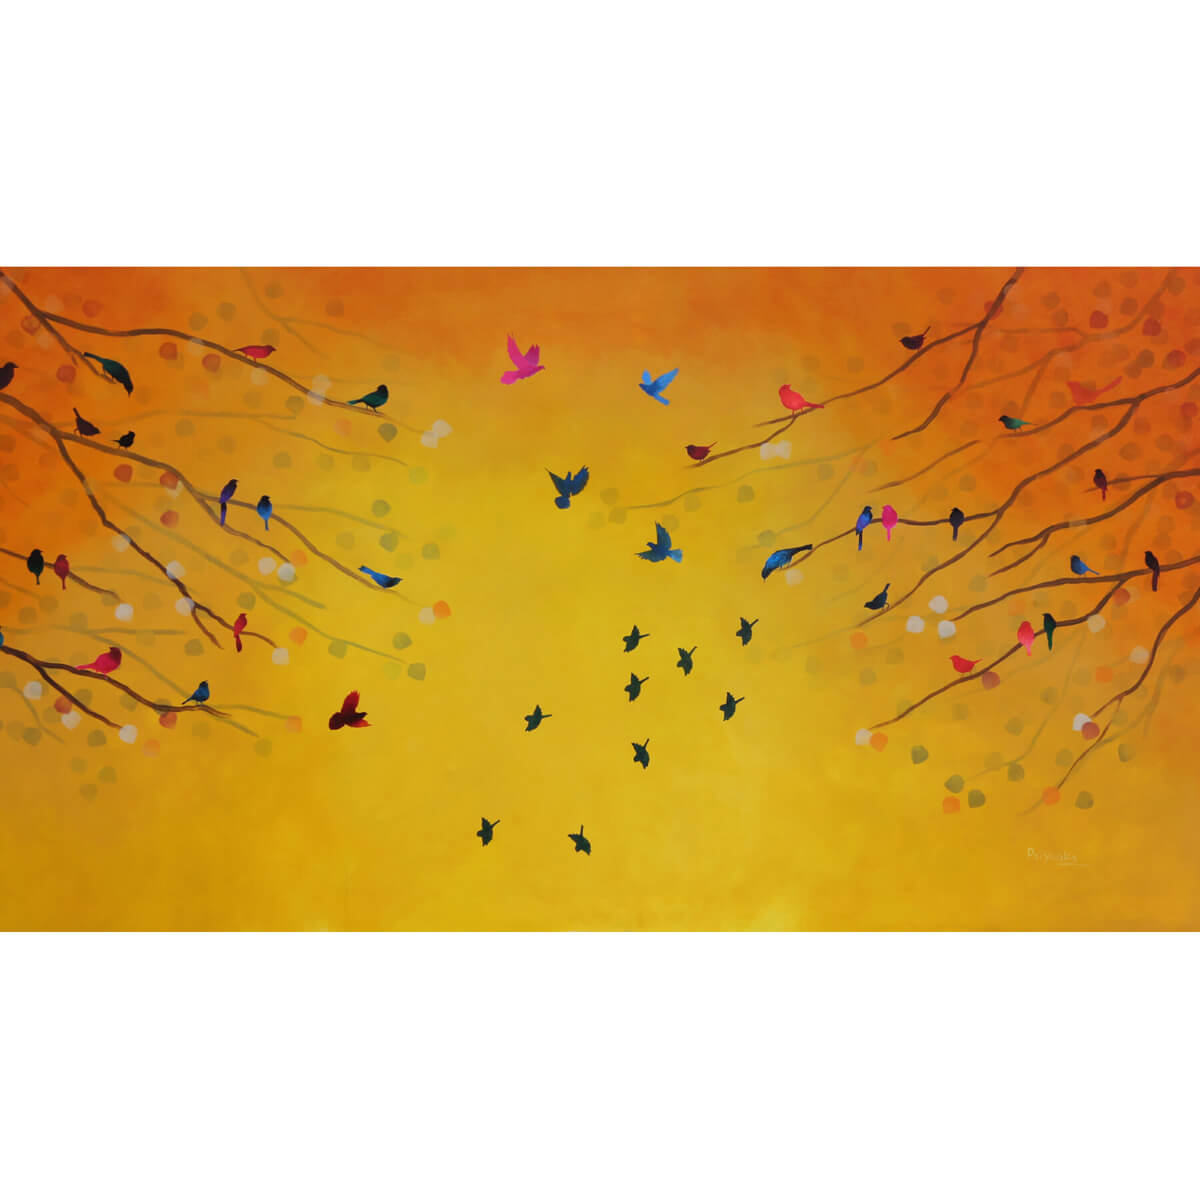 Song from Autumn Reusable Face Mask - Priyanka Waghela